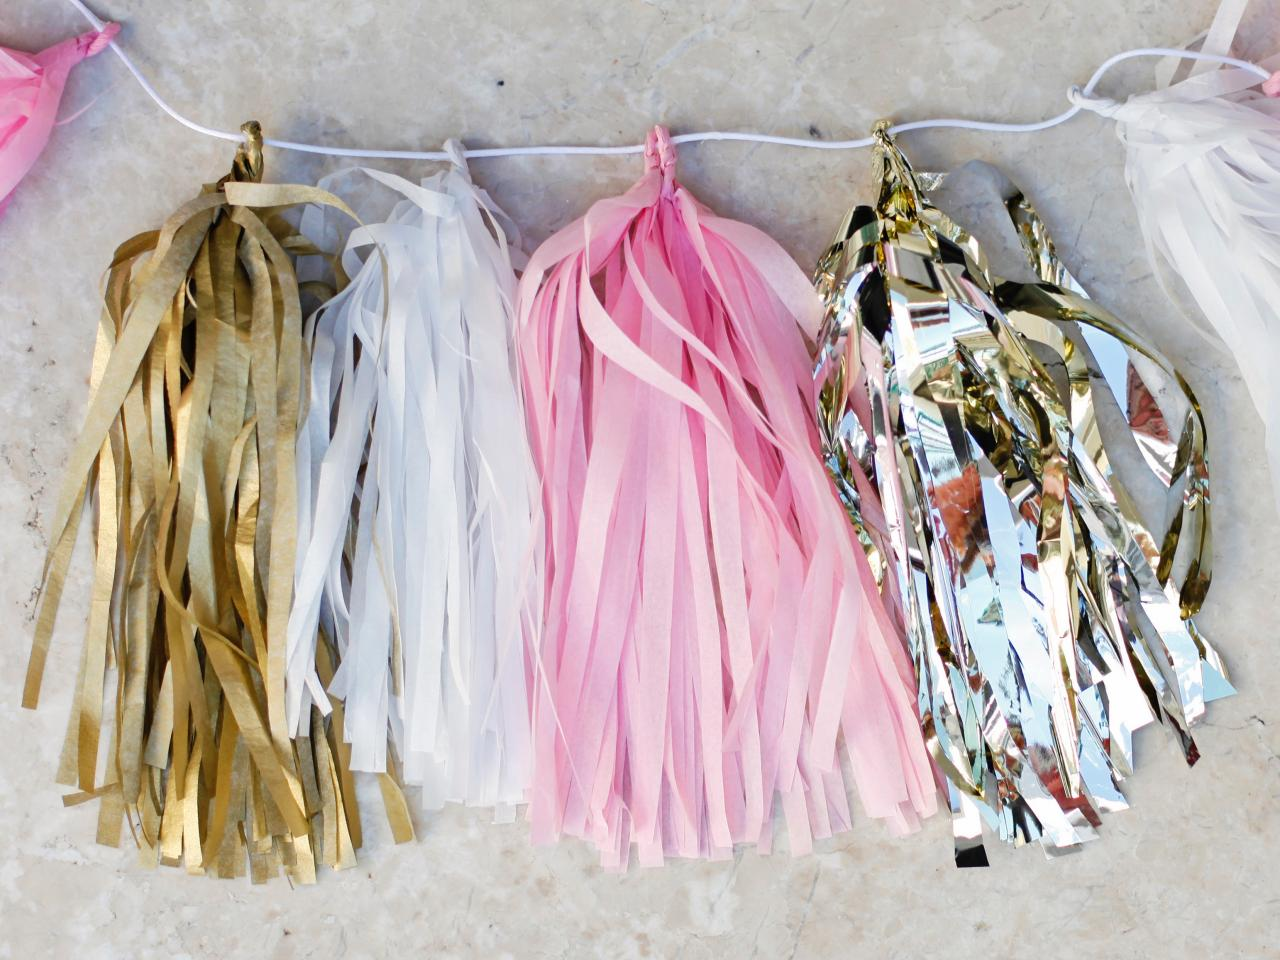 Tissue paper tassel tutorial - Create More Tassels And Finish Garland